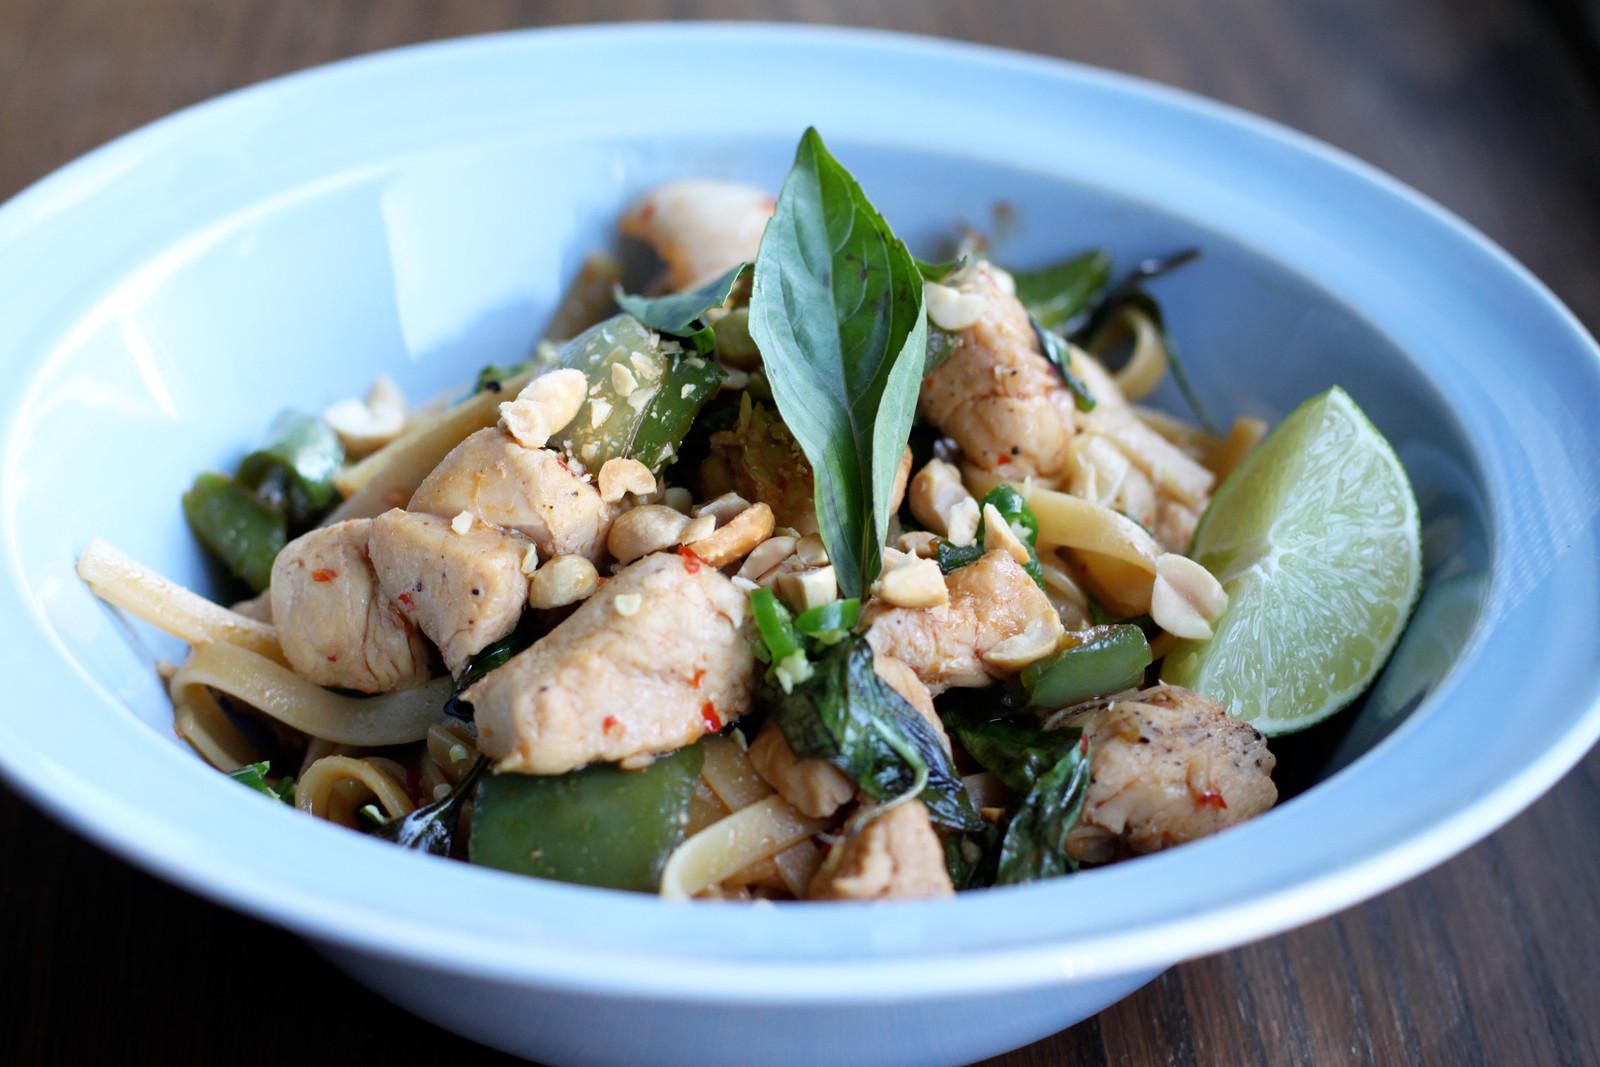 Thai Drunken Noodles Recipe  Thai Drunken Noodles – Simple fort Food – Recipes that